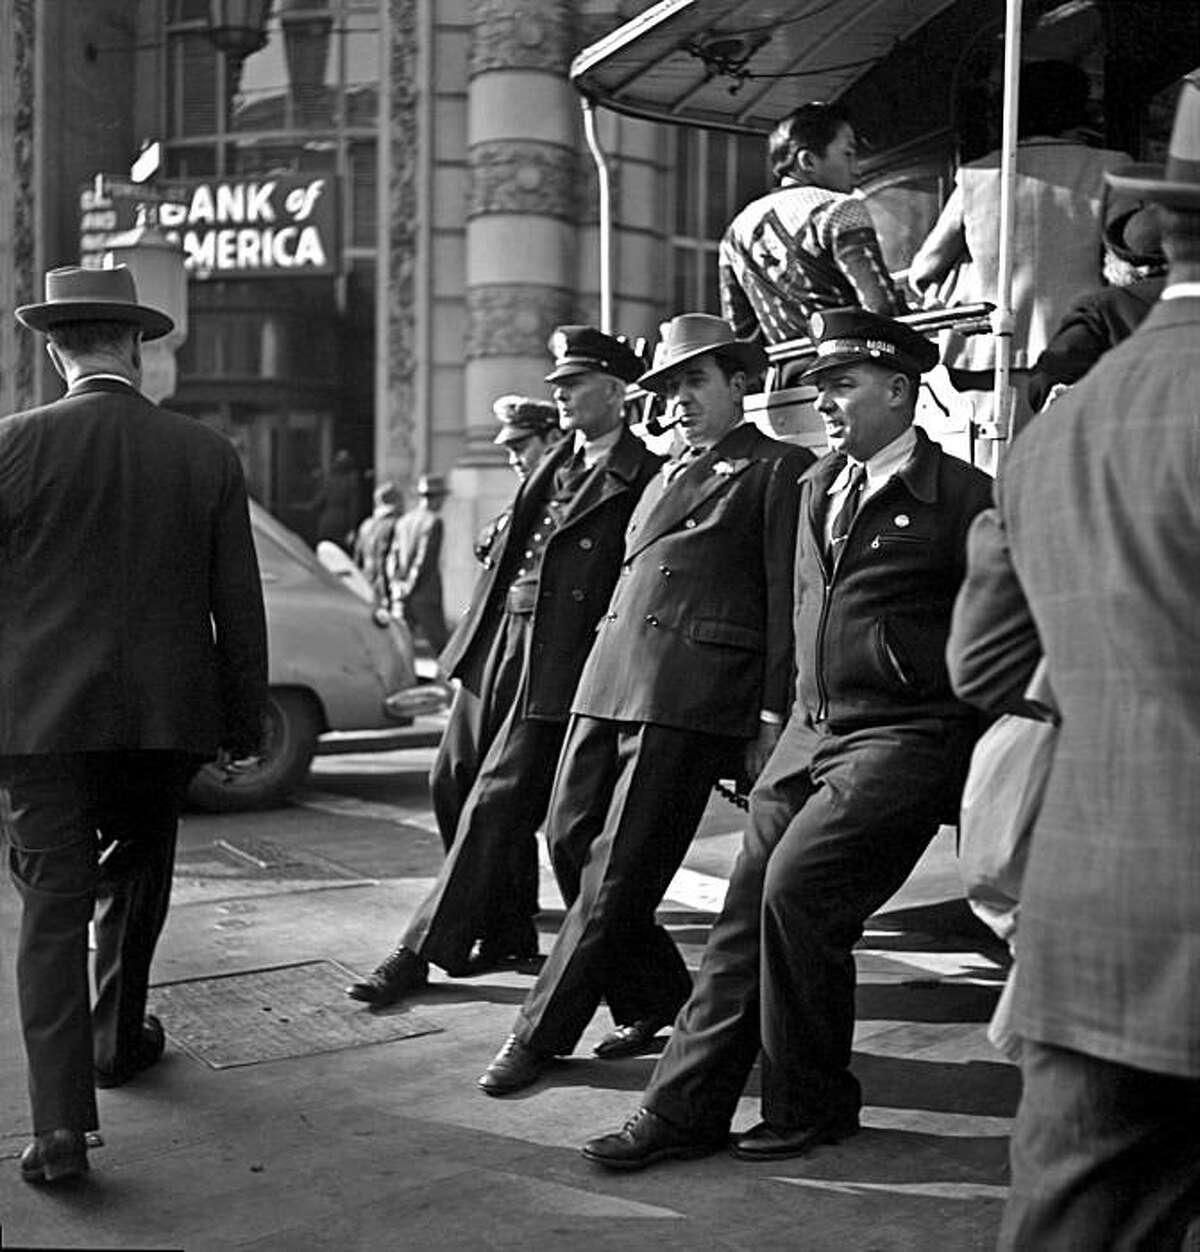 Cable Car turnaround, 1946